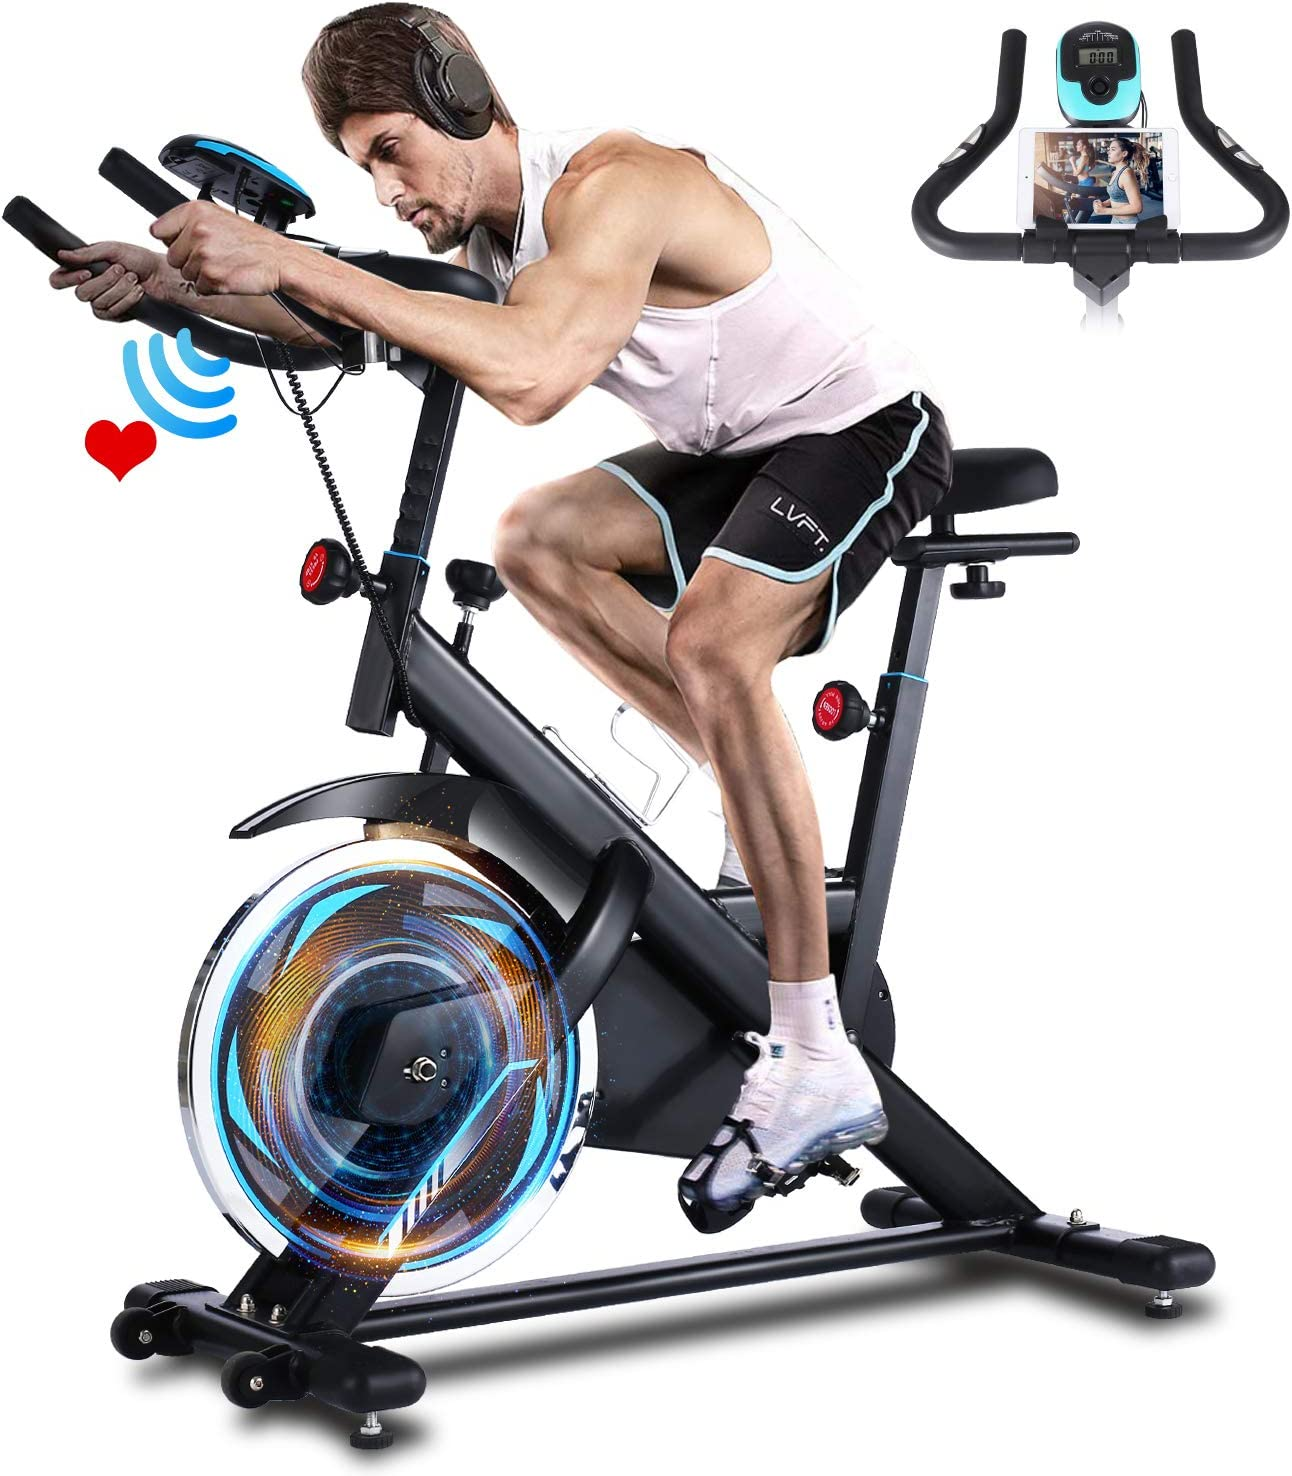 ANCHEER Heimtrainer, Indoor Cycling Bike Fitnessbike Mit Herzfrequenzmonitor & LCD Monitor